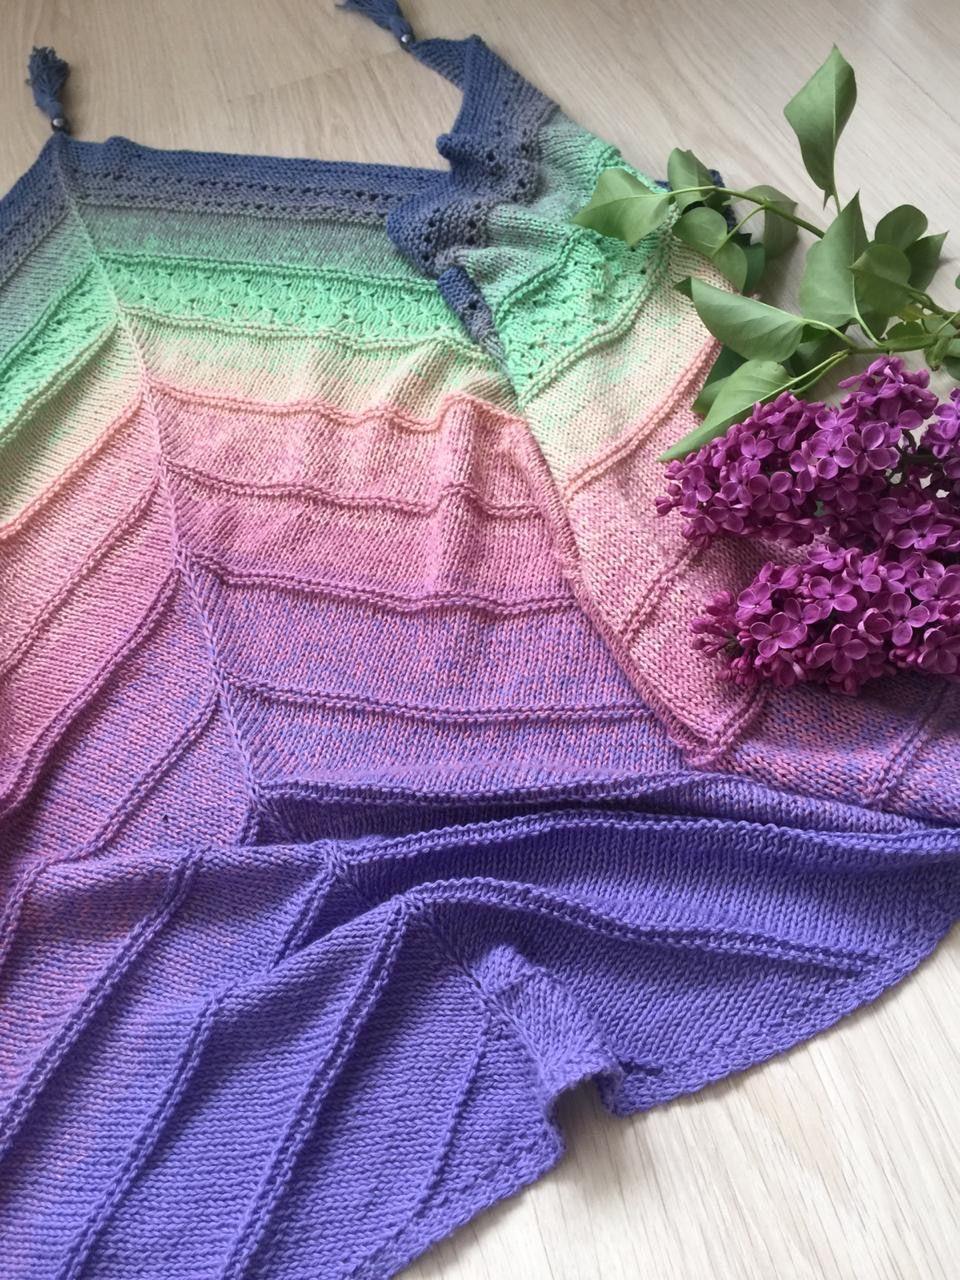 Whirl ShipsScheepjeswol mixed yarn 1 ball for 1 shawl